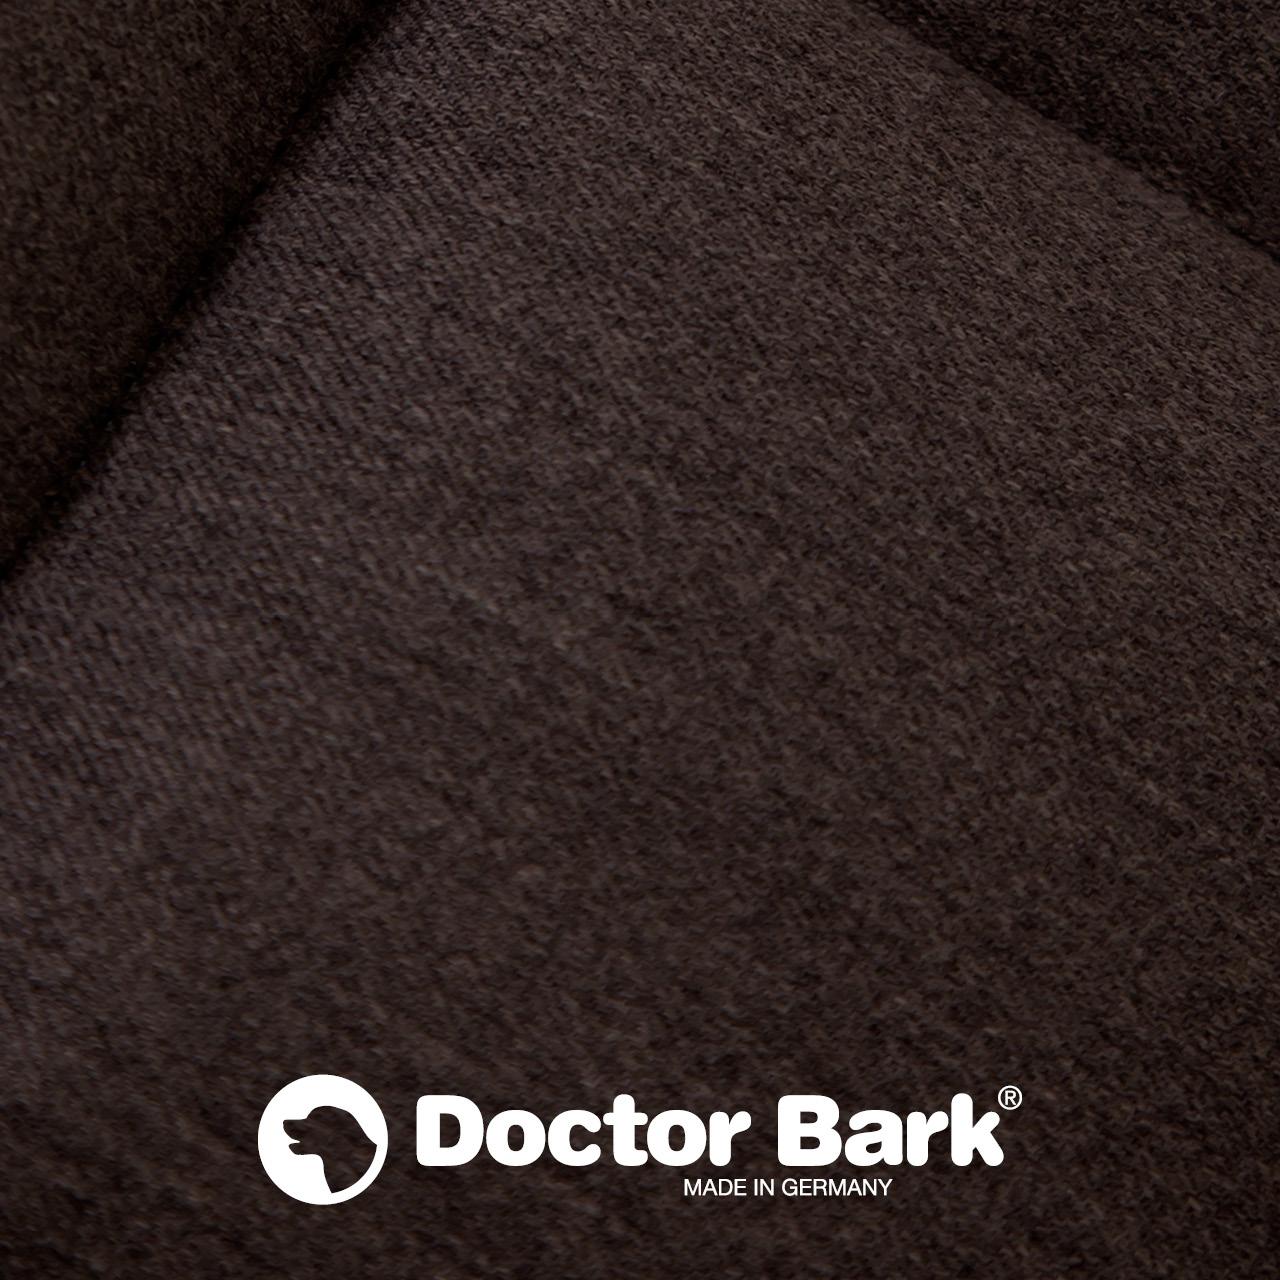 eckiges Doctor Bark Hundebett mit Rand Gr. M - braun